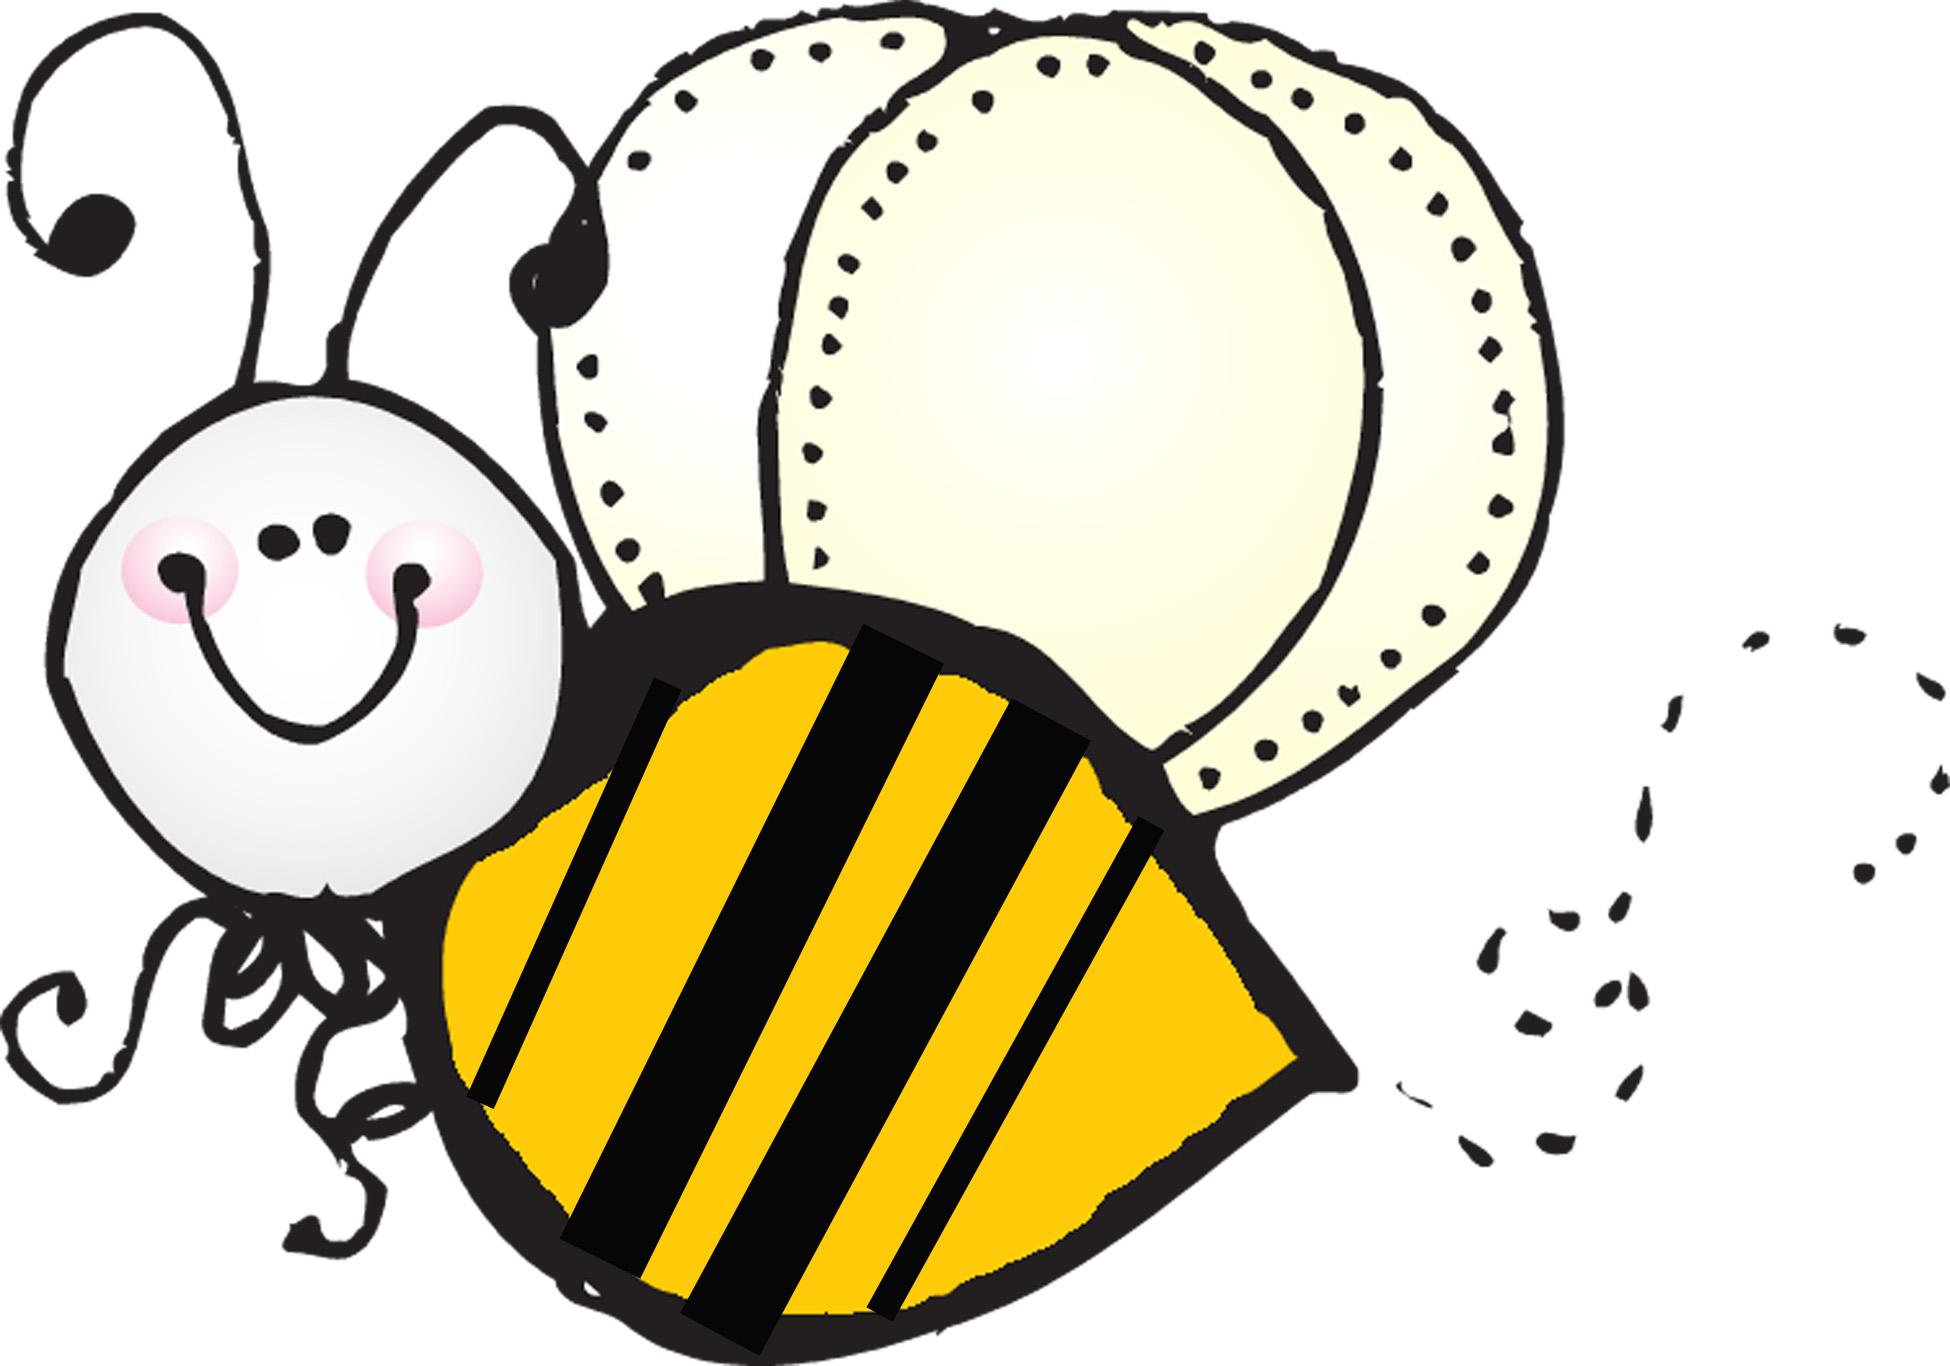 Bumble bee vector bee clipart .-Bumble bee vector bee clipart .-12